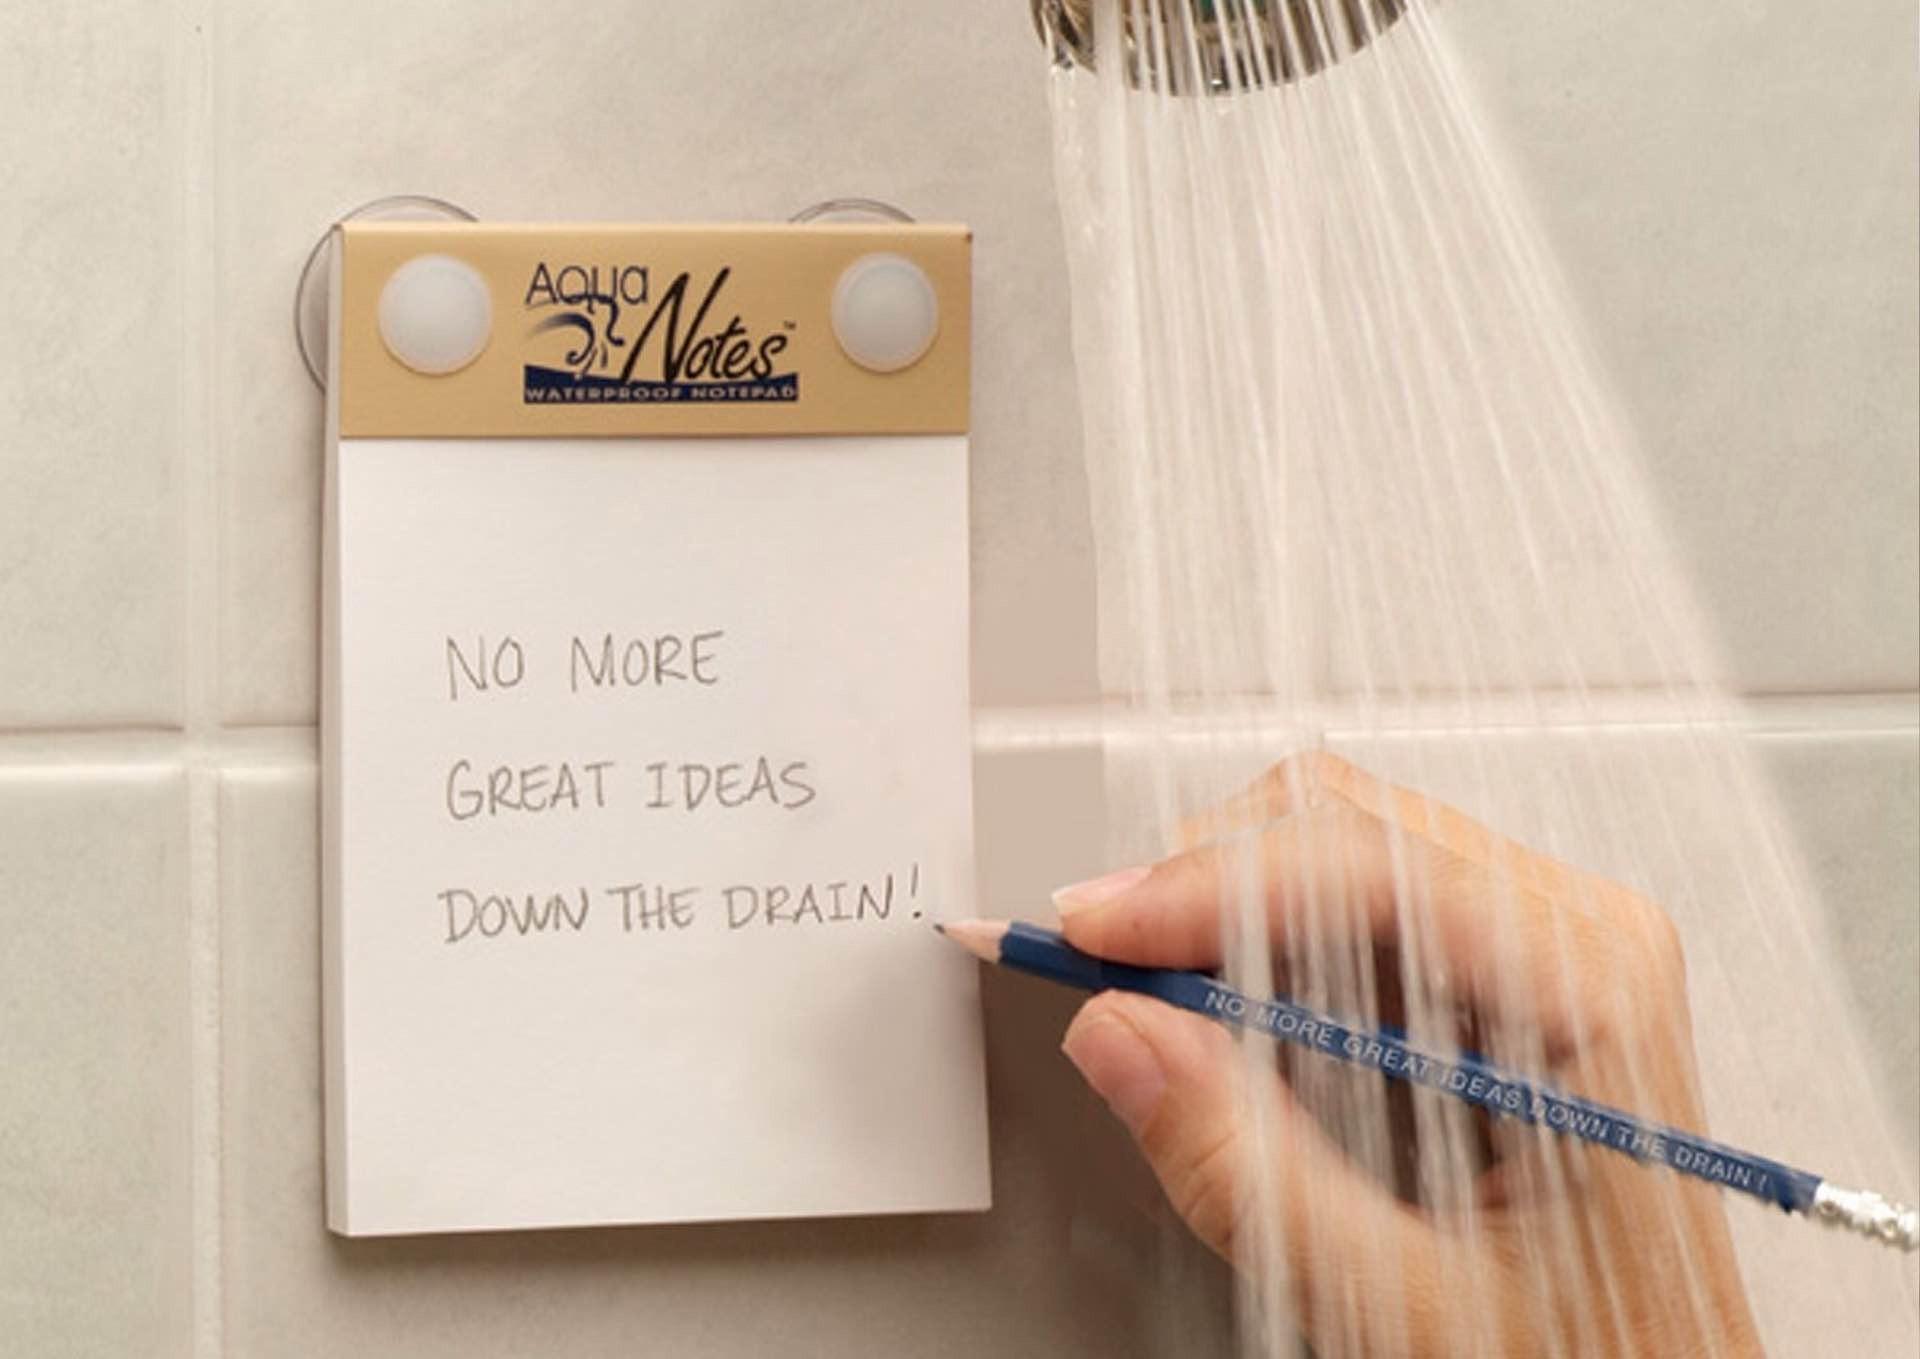 AquaNotes waterproof notepad. ($8)